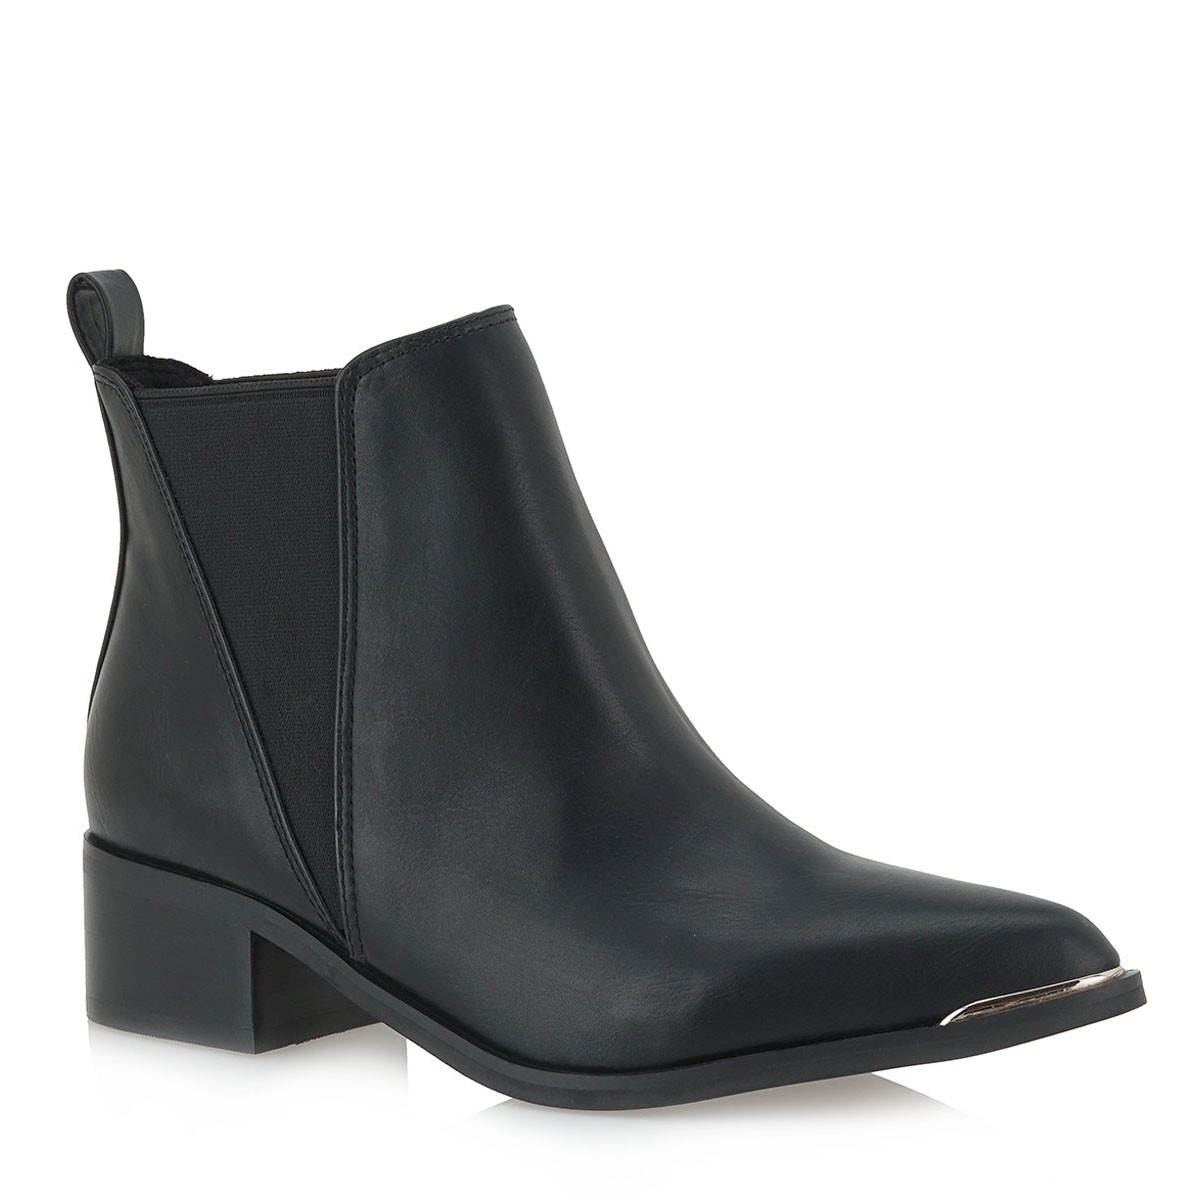 Exe Shoes Γυναικεία Μποτάκια 036-SABRINA-630 Μαύρo J3700362001